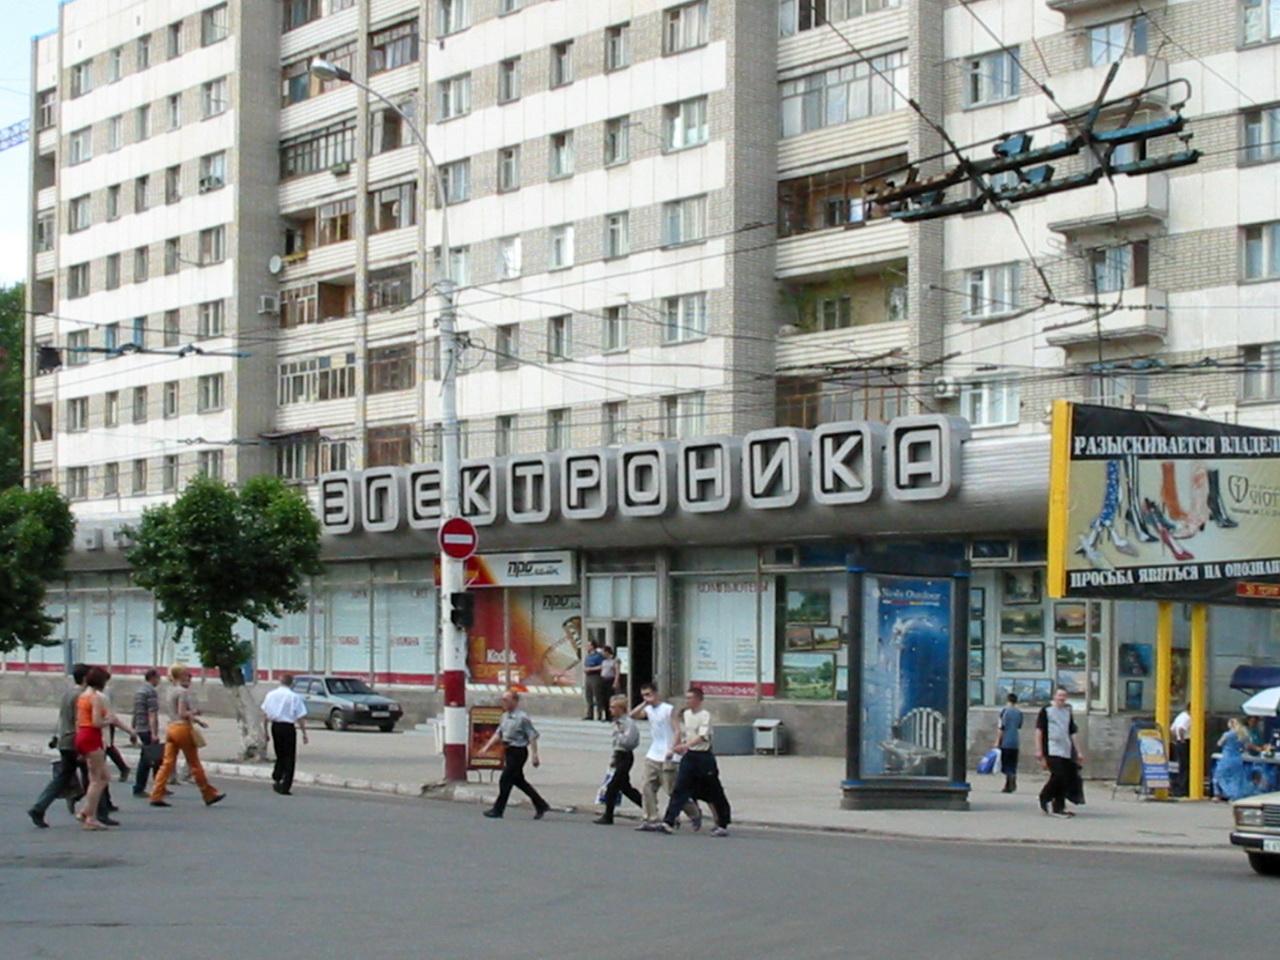 2003-03-24 московская чапаева электроника.jpg